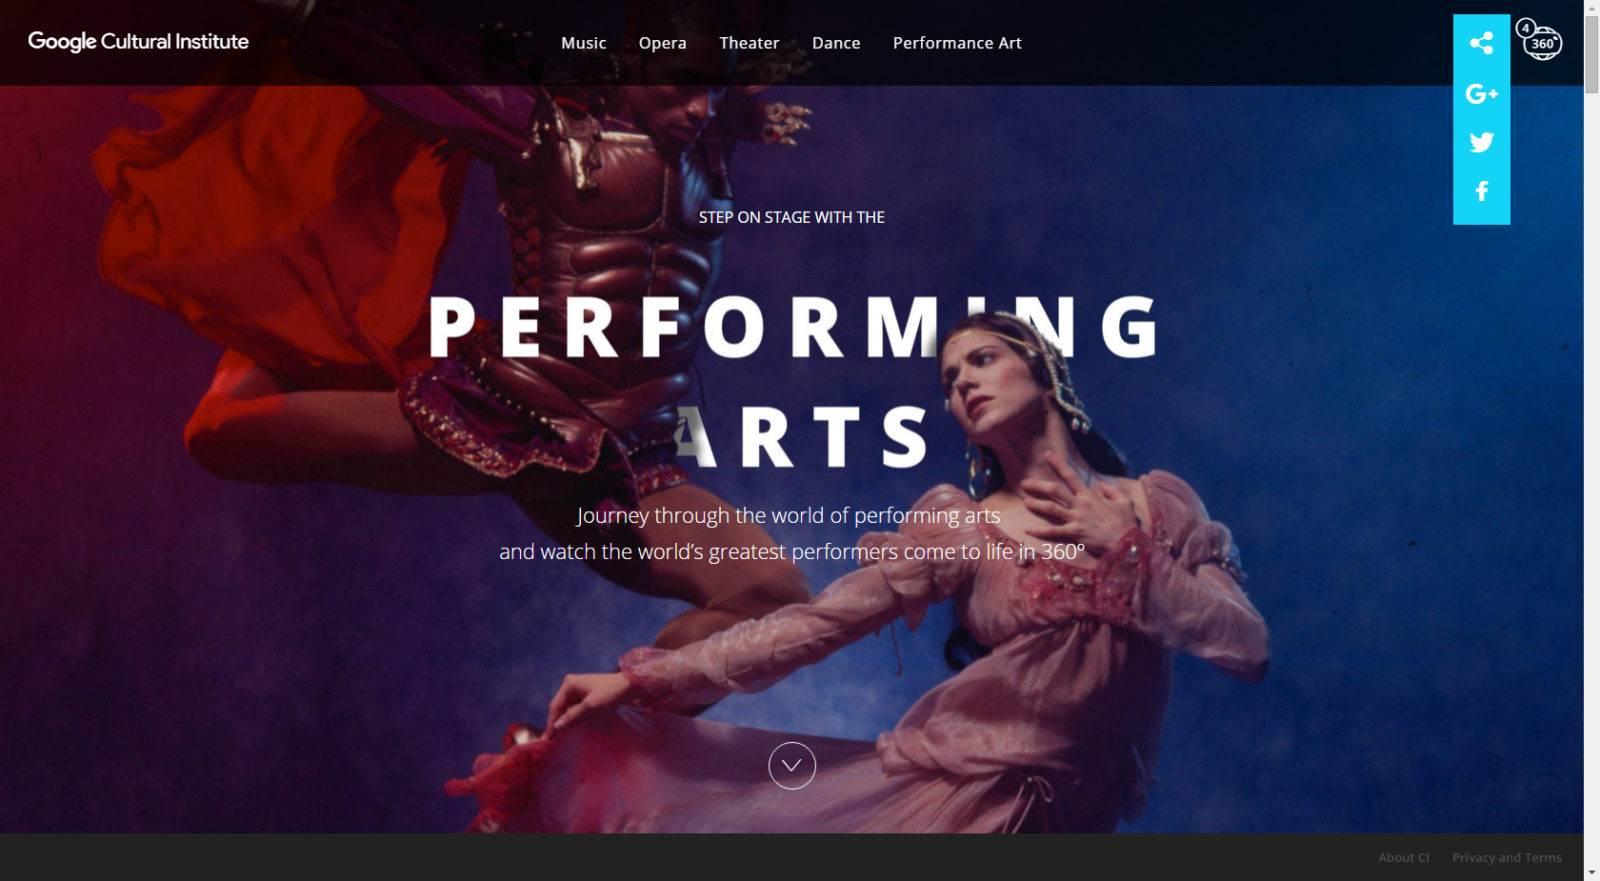 performingarts.withgoogle.com 2015-12-08 14-14-06